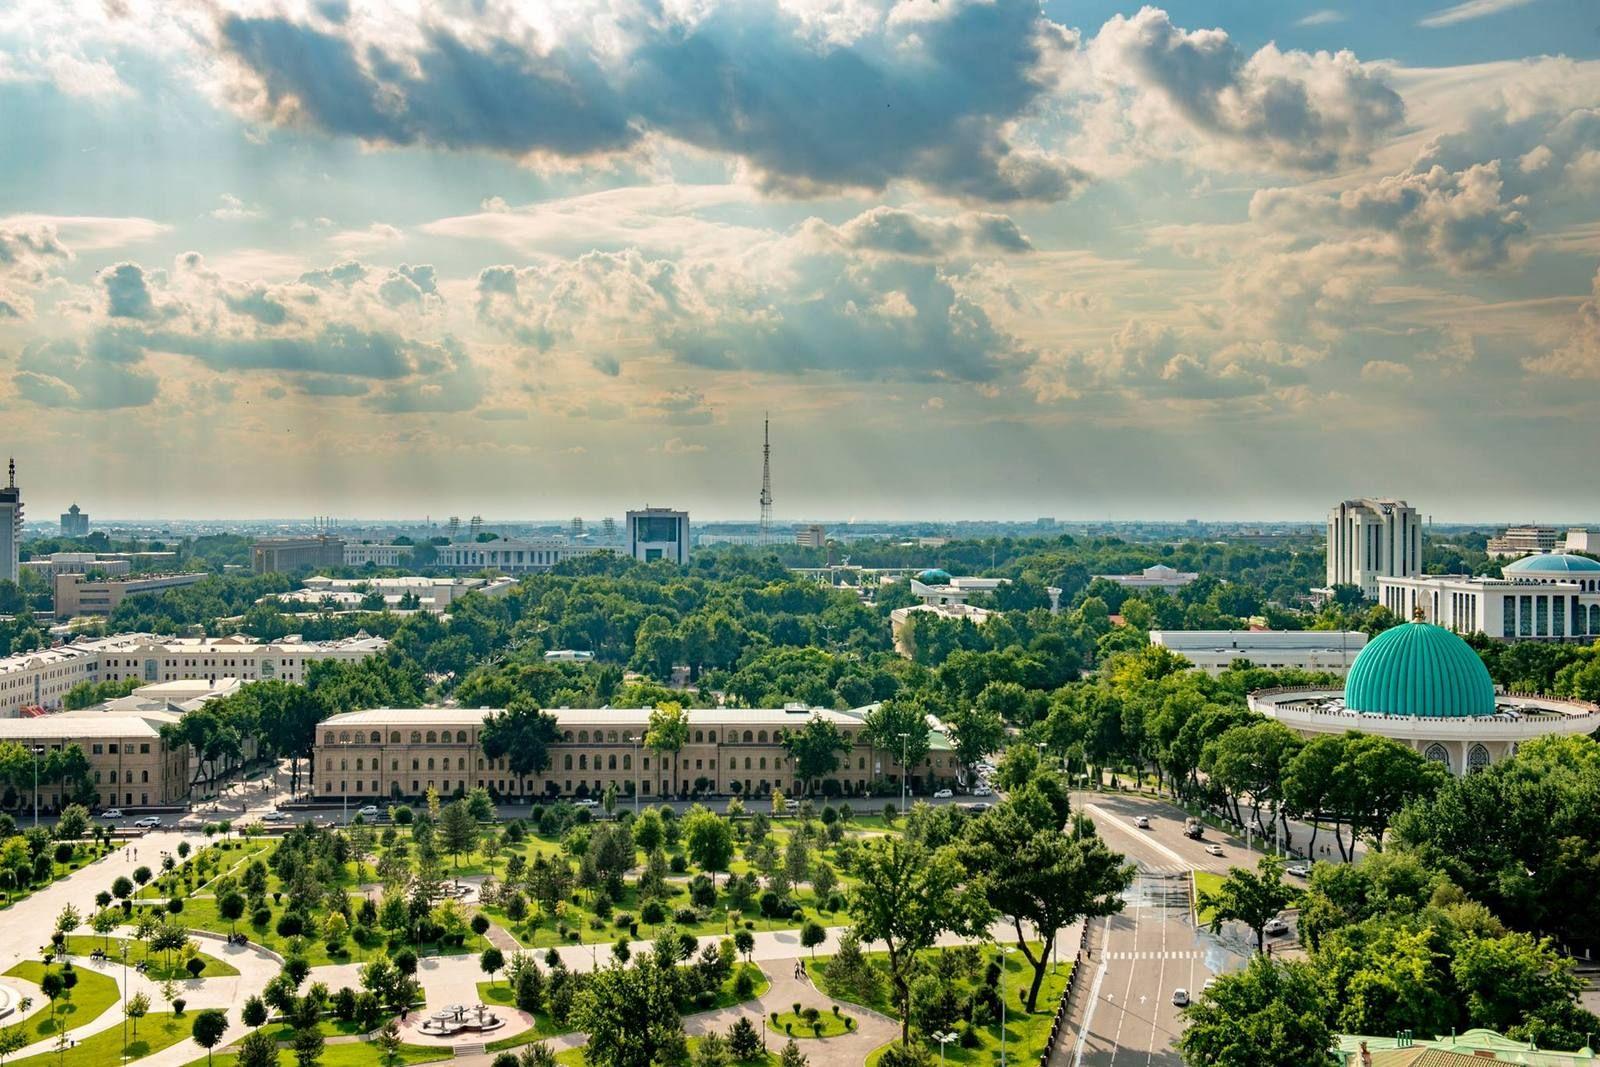 актер картинки узбекистан хорошие красивый туристический